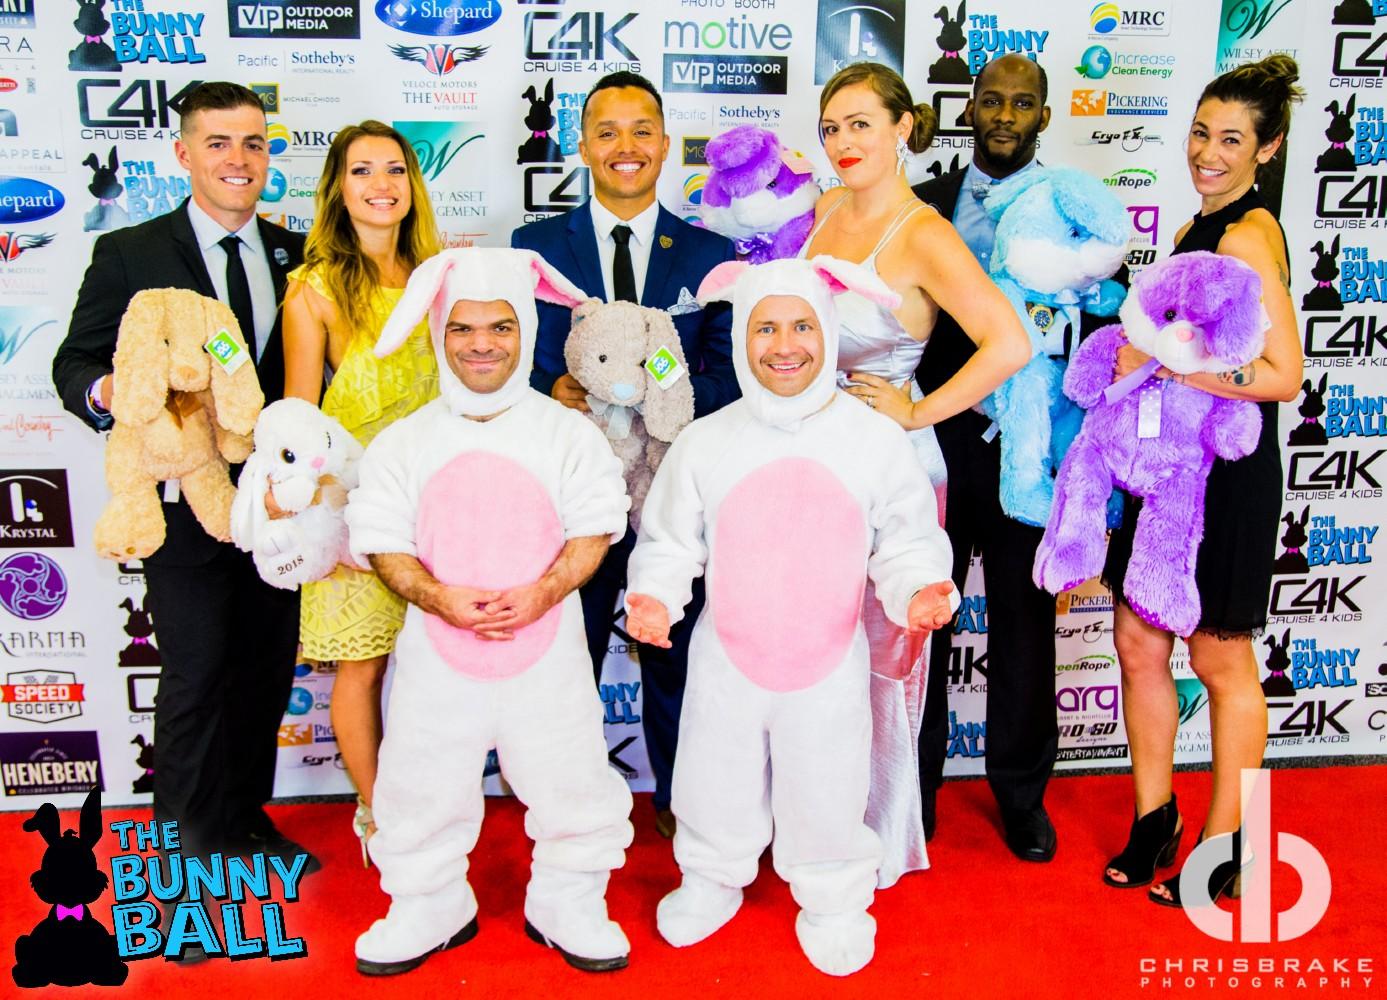 Bunny-Ball-2018-Chris-Brake- 87.jpg